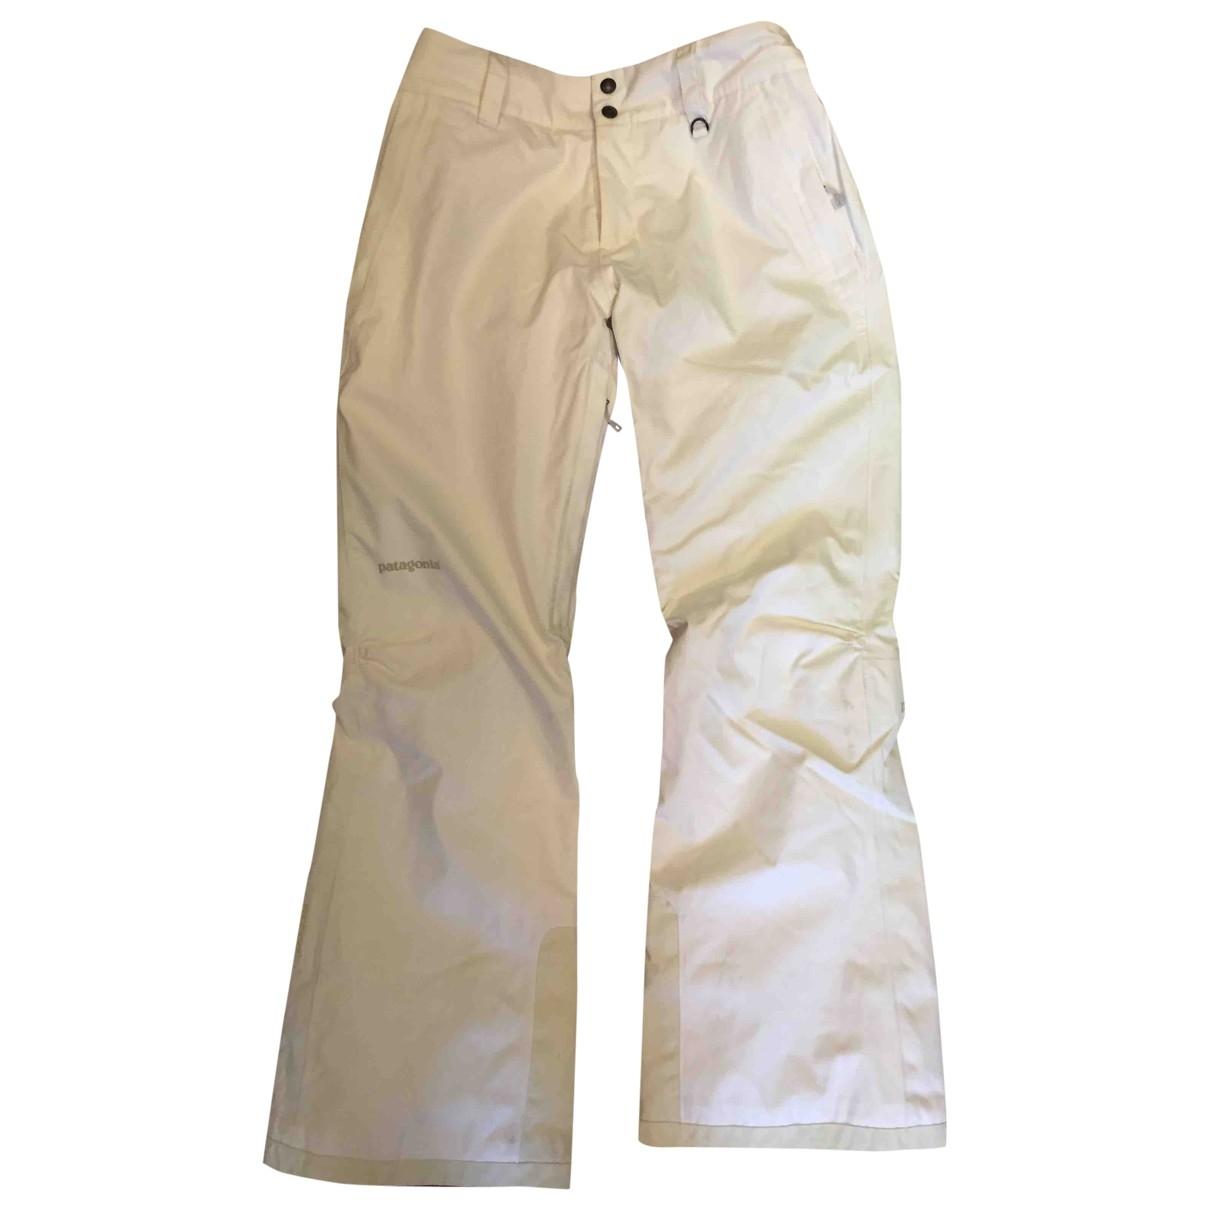 Patagonia Trousers